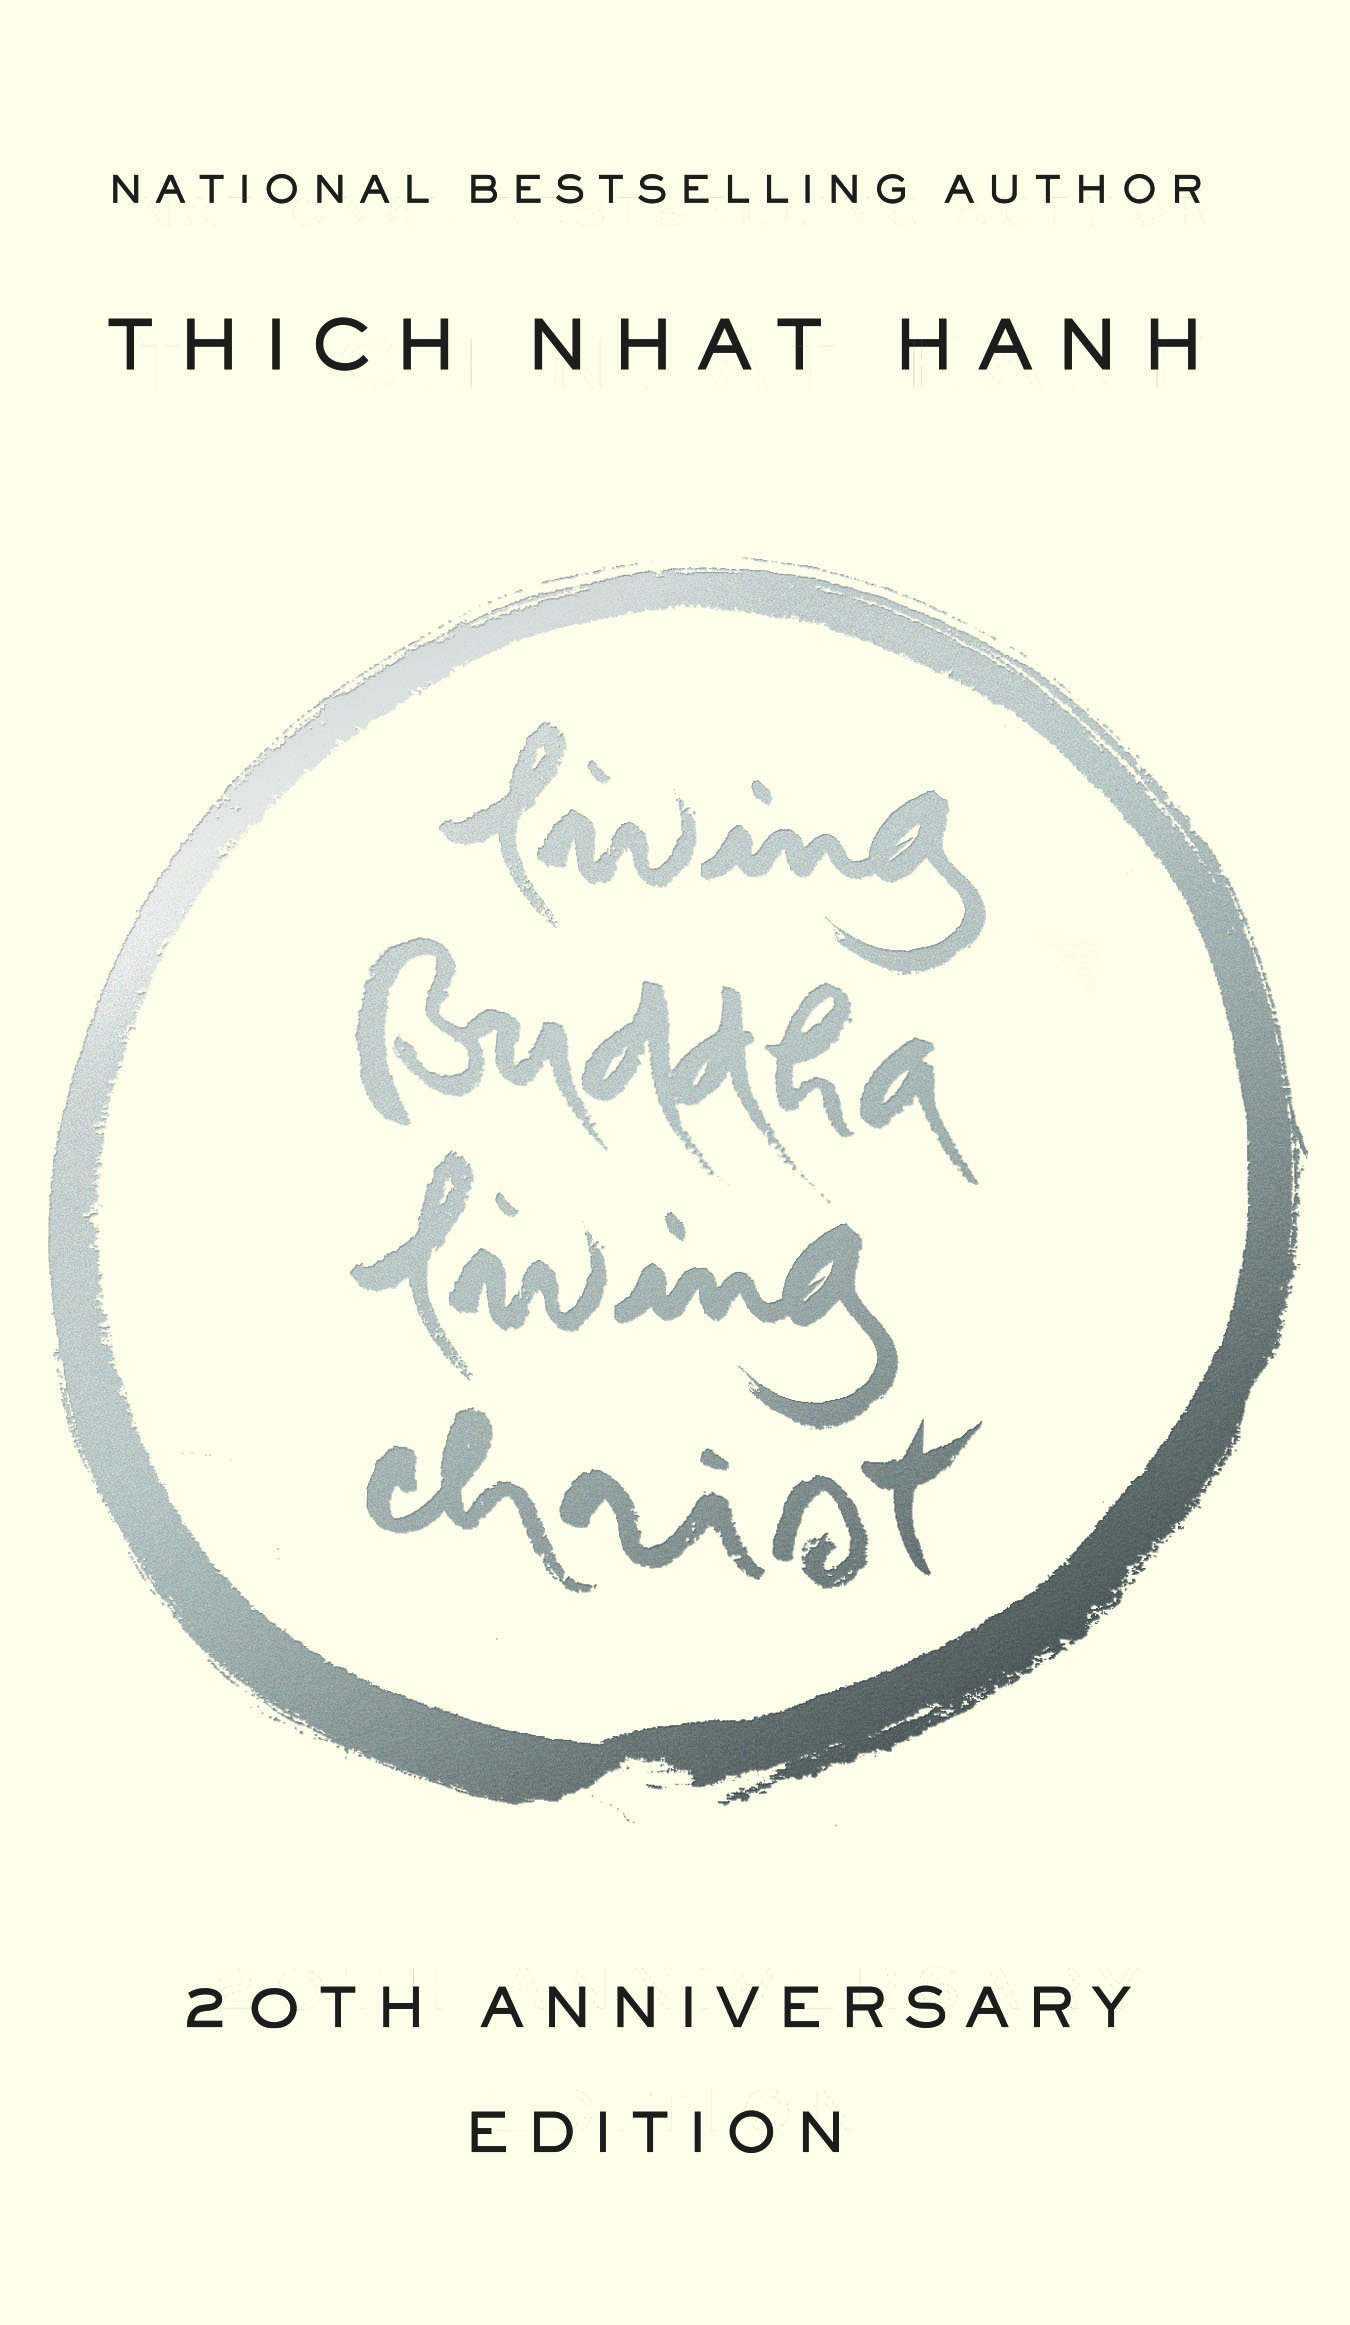 Living Buddha Christ 20th Anniversary product image